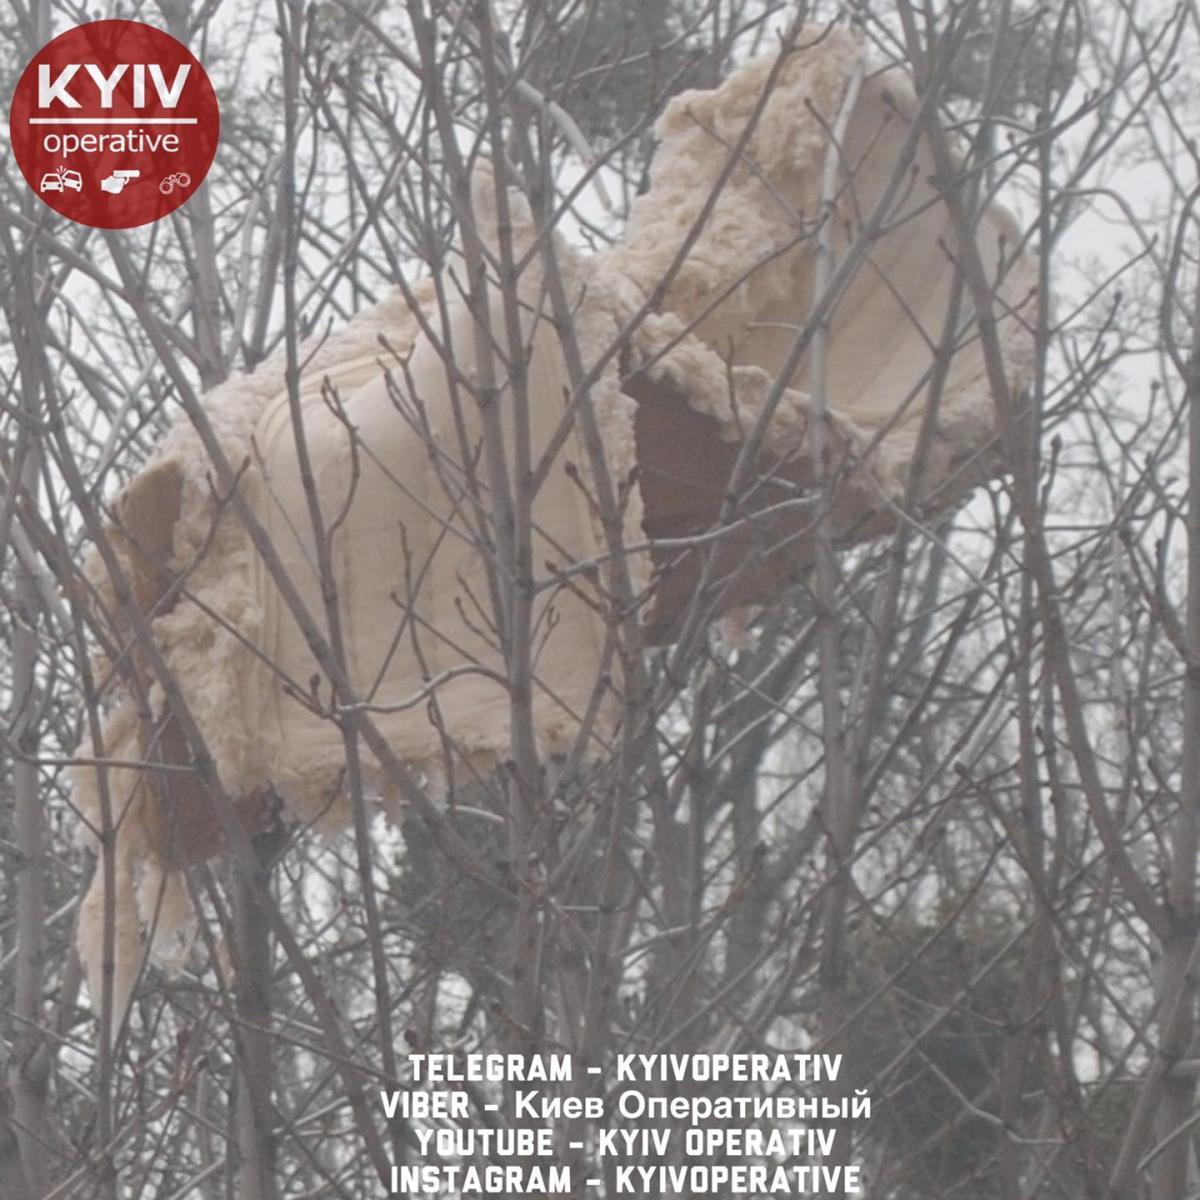 Диван застряг на дереві / Киев Оперативный Facebook